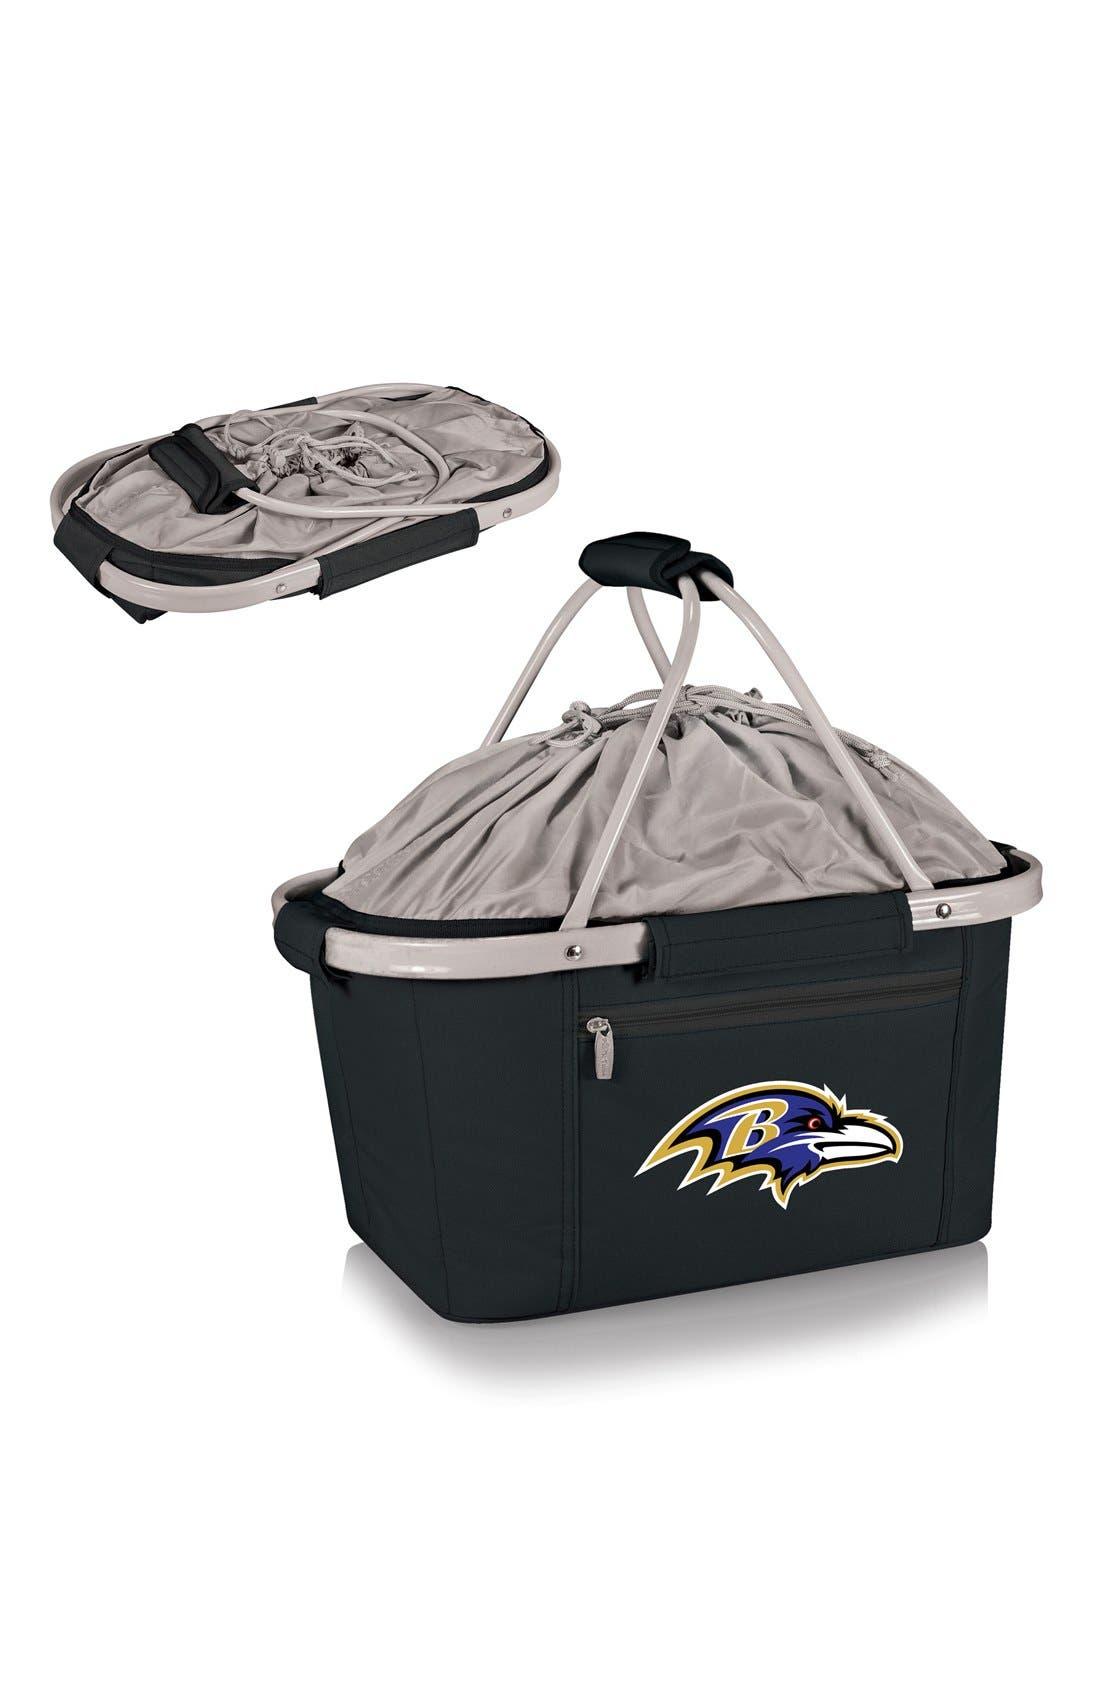 Metro NFL Collapsible Insulated Basket,                             Alternate thumbnail 2, color,                             Baltimore Ravens/ Black